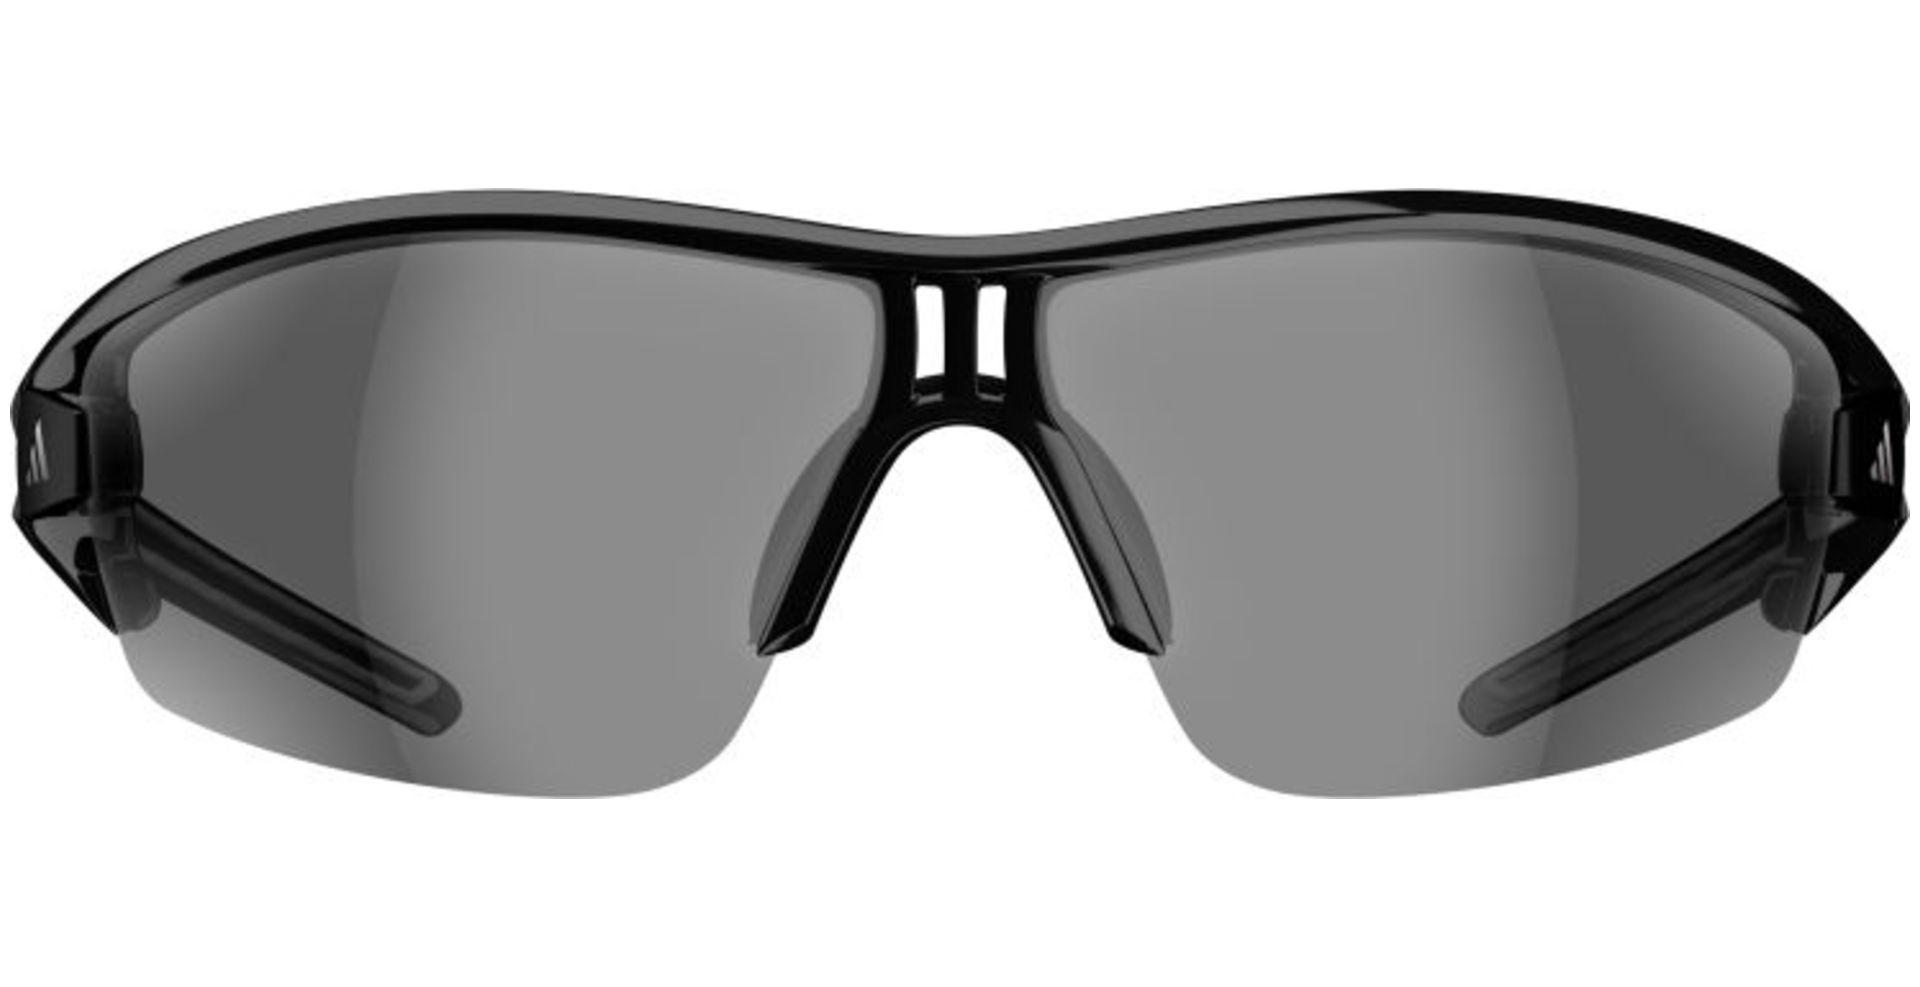 c99fa20356be adidas - Evil Eye Halfrim Large A402 00 6065 5720 Shiny Black - von ...